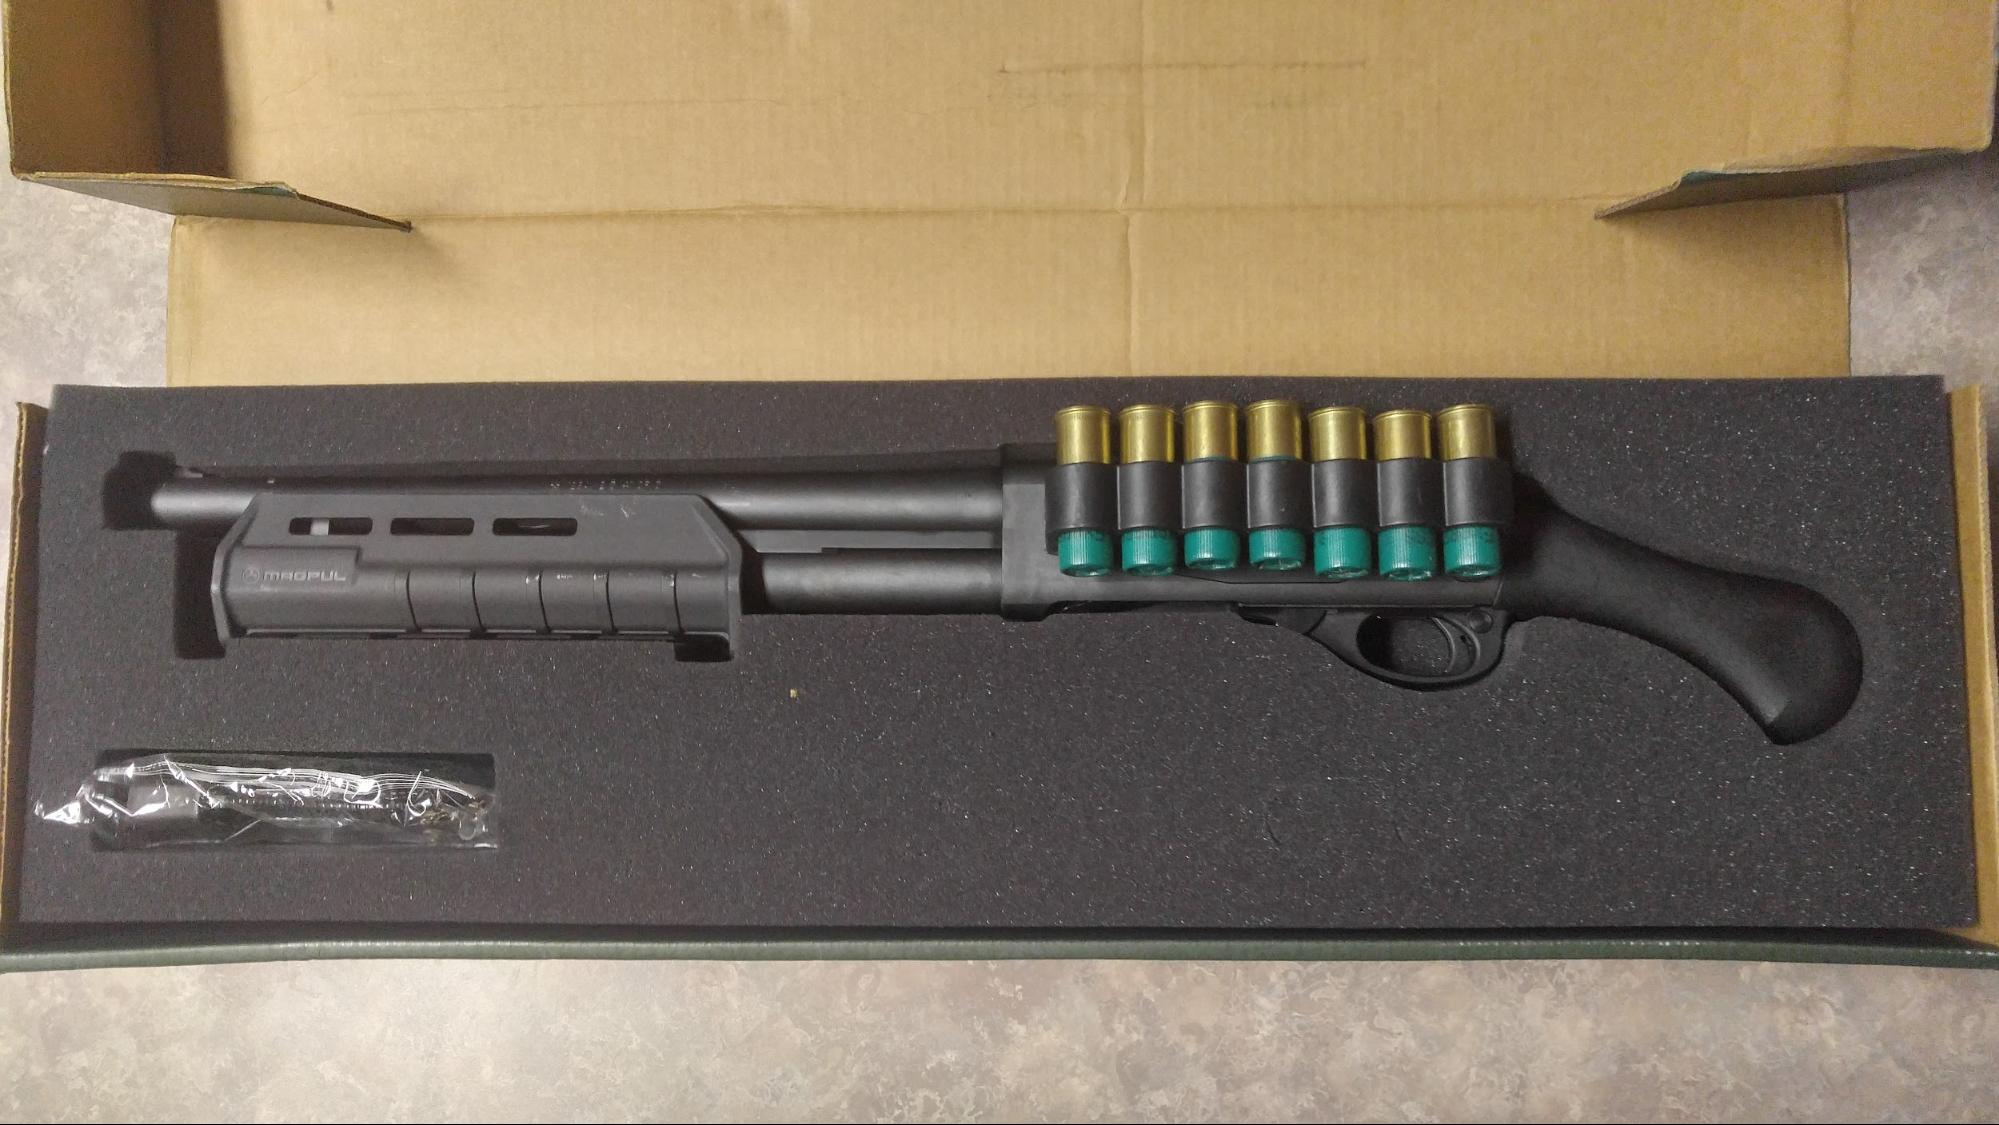 Tac-14 in Box